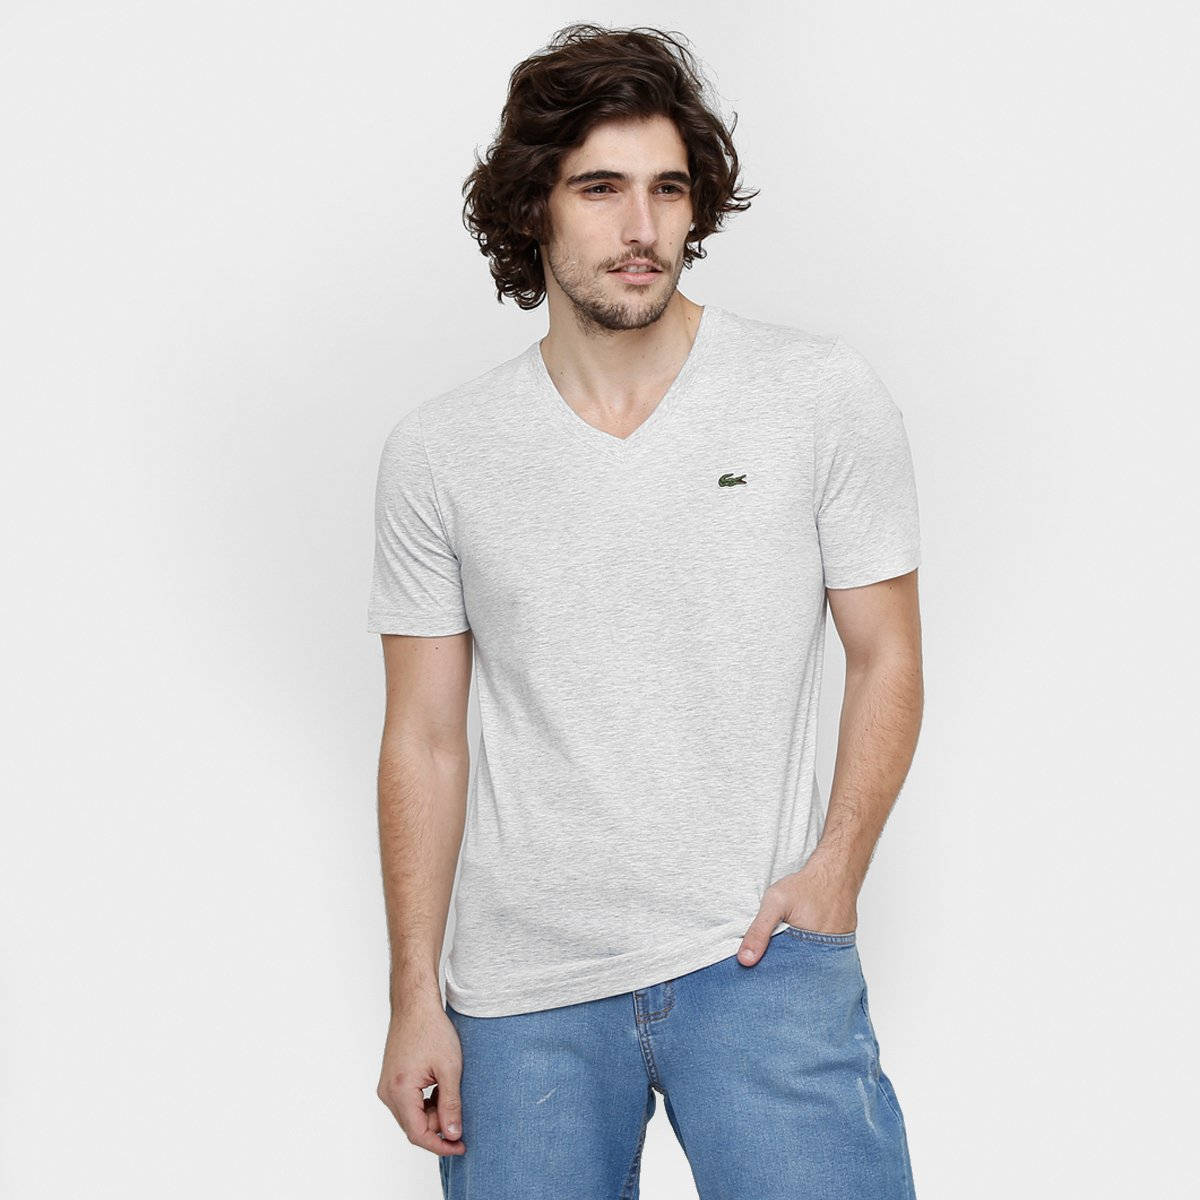 8cba510787 Camiseta Lacoste Lisa Gola V - Compre Agora